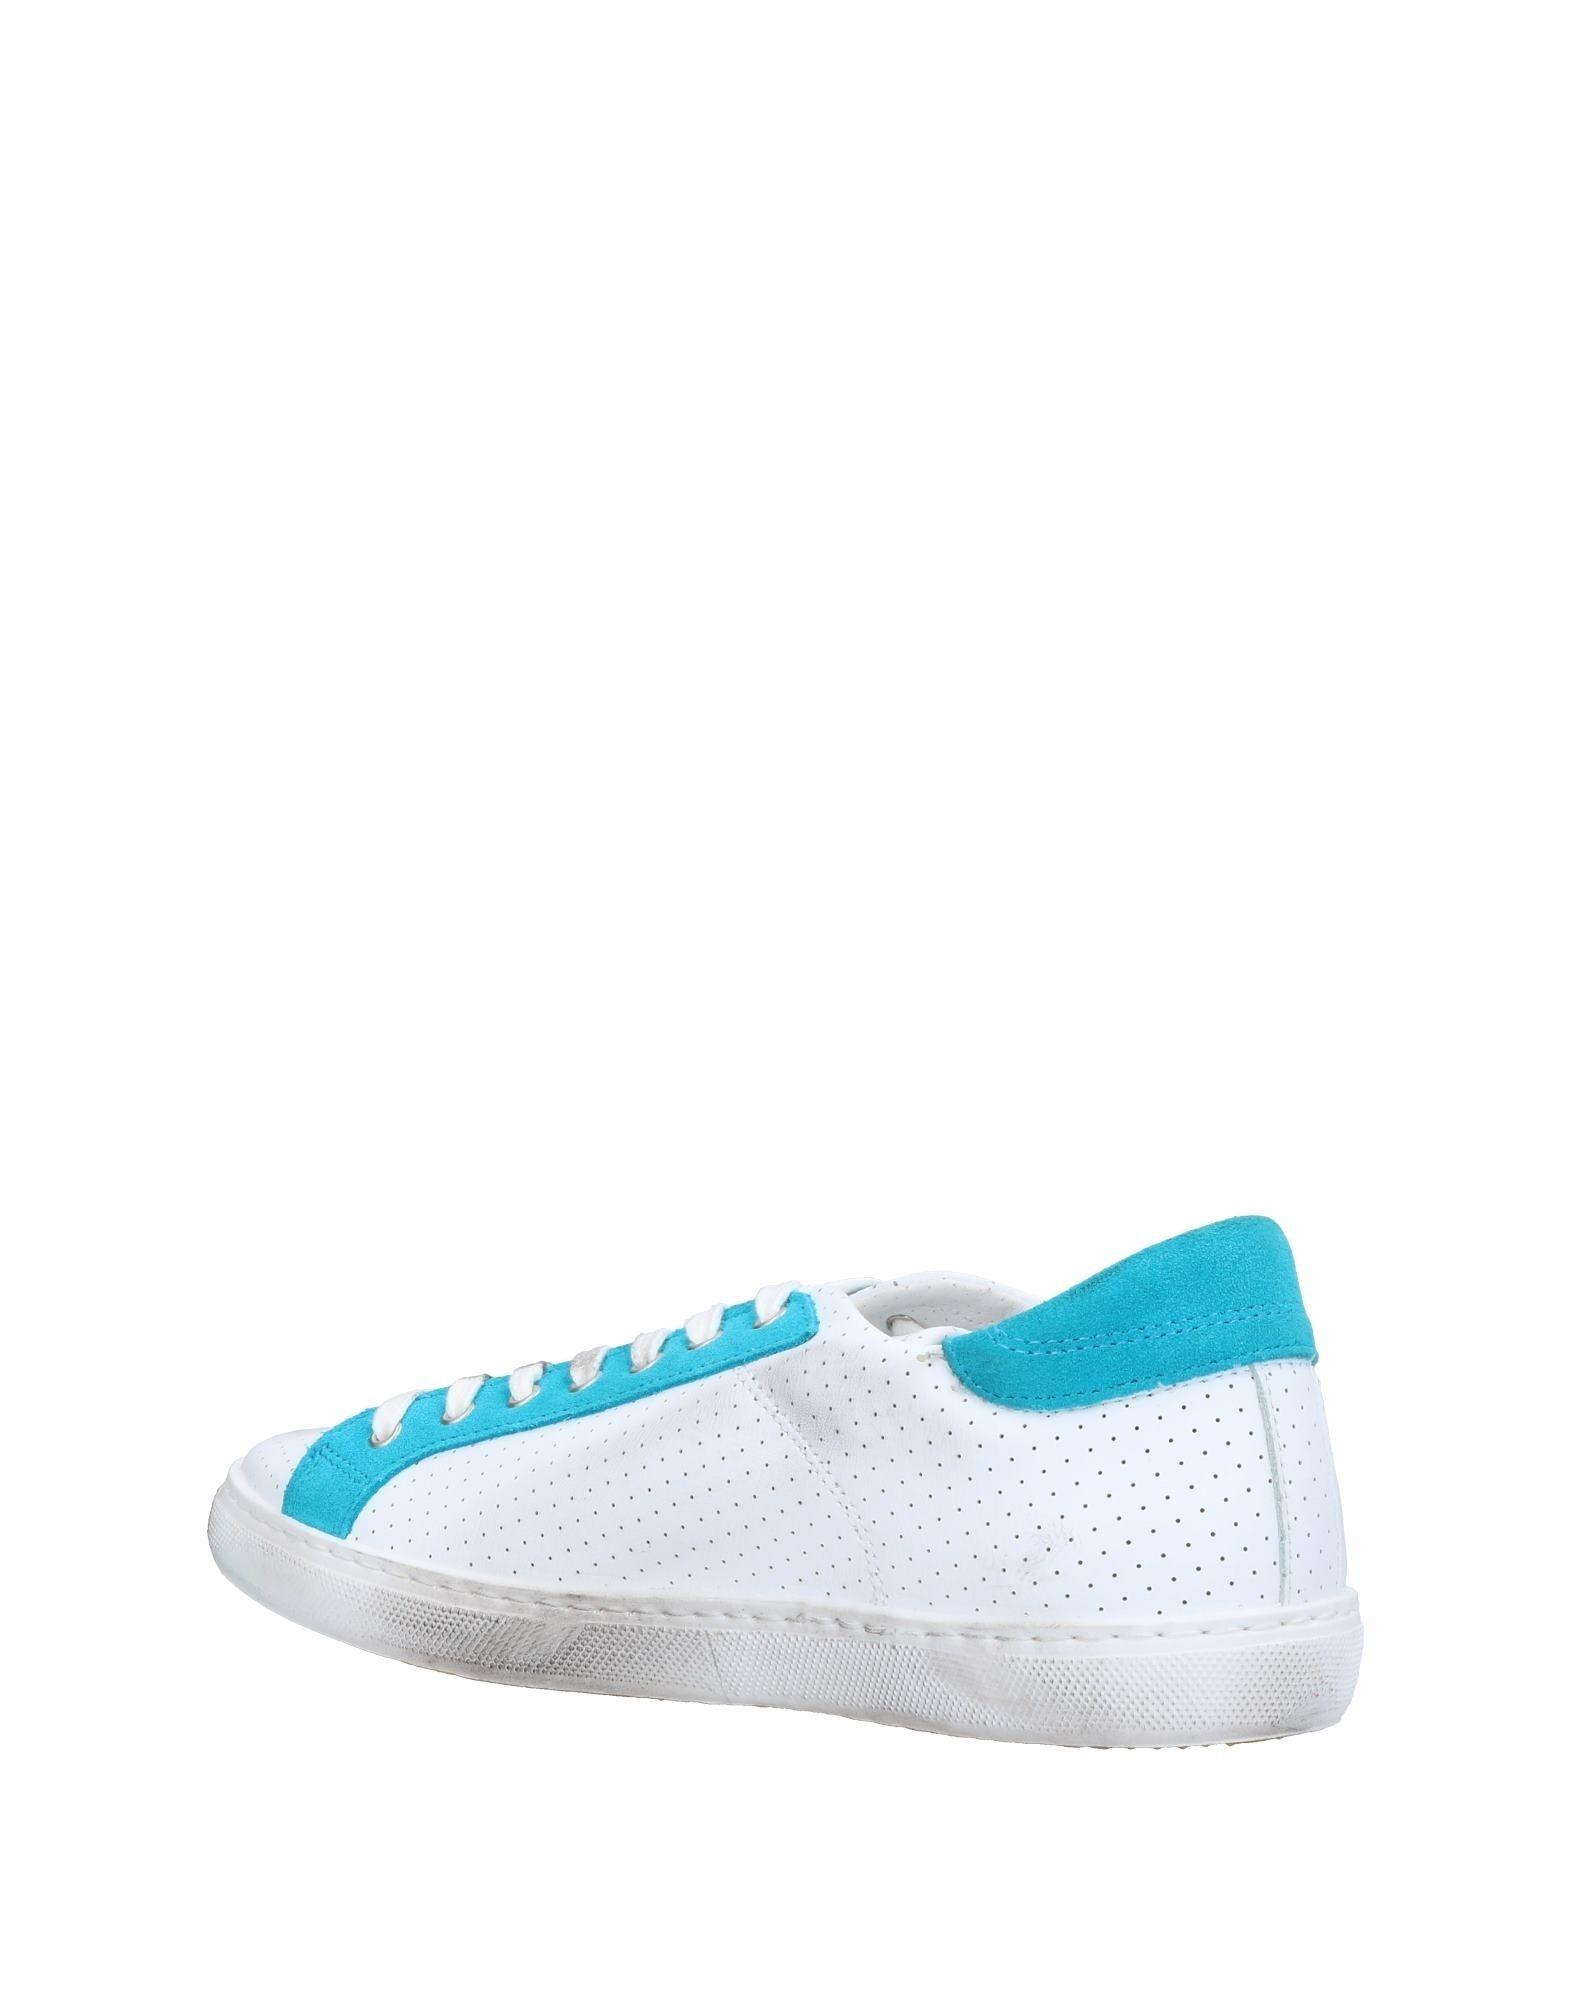 2Star Sneakers Damen  11407785AU Gute Qualität beliebte Schuhe